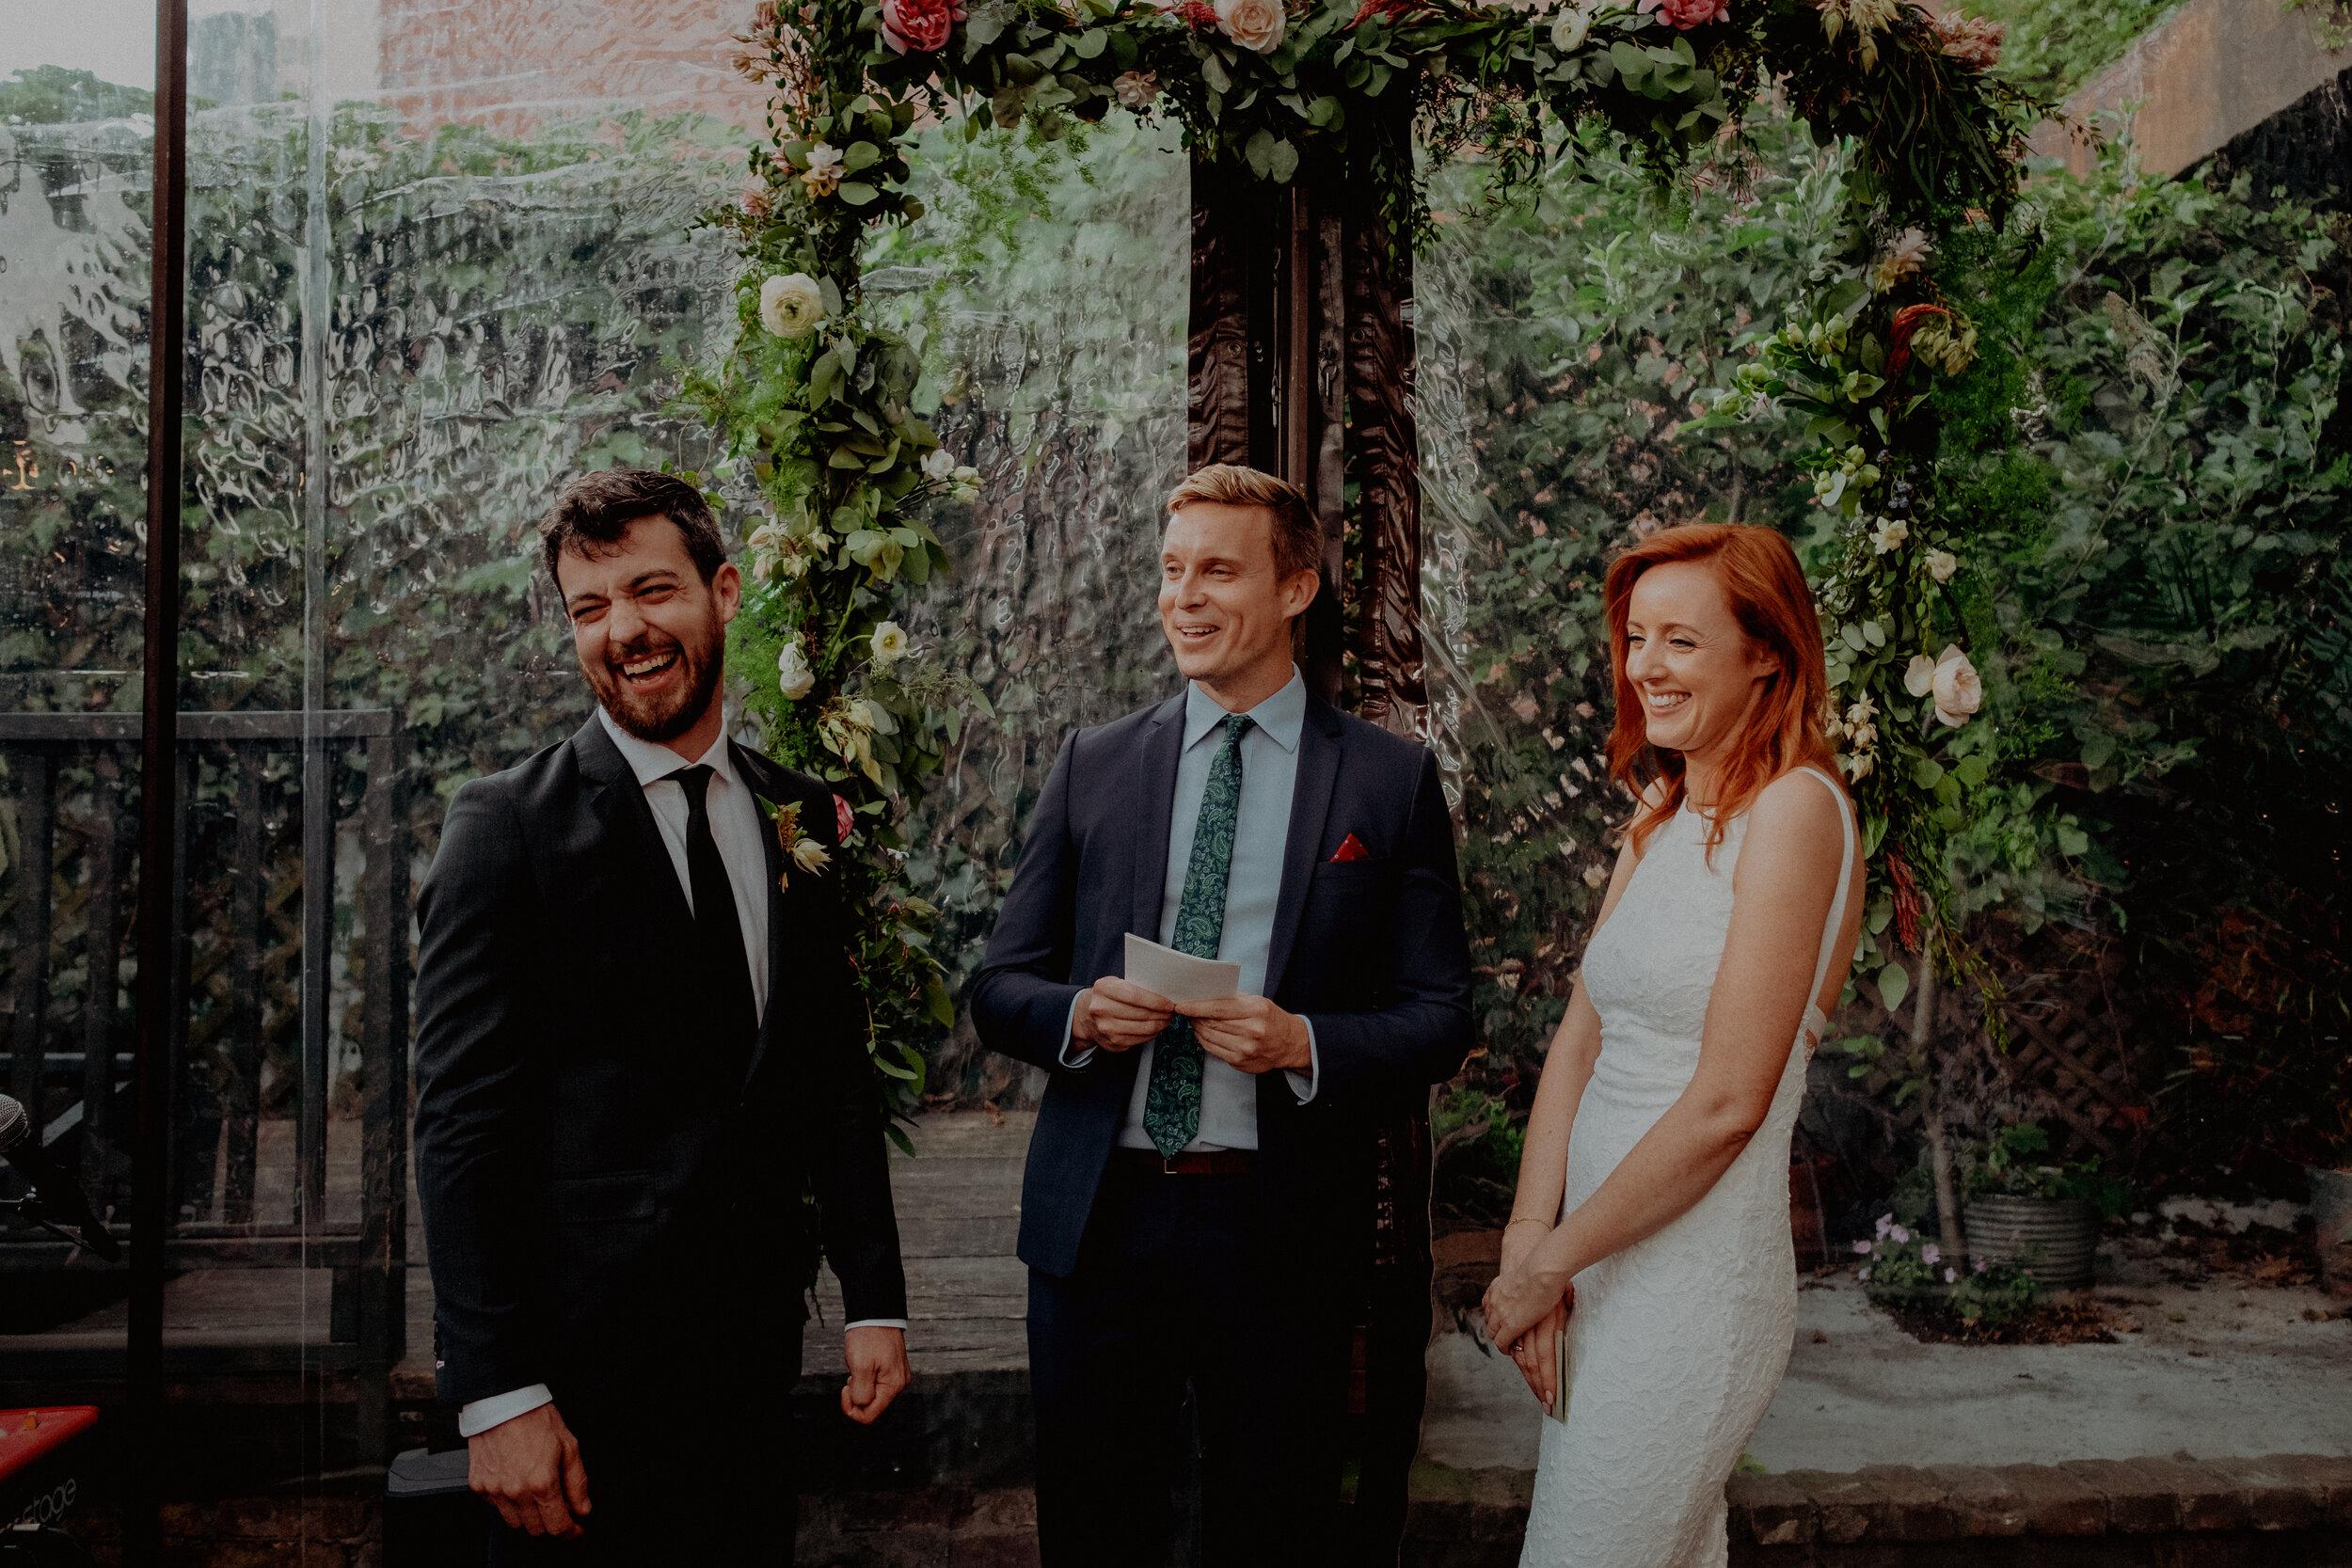 Aurora_Brooklyn_Wedding_Photographer_Chellise_Michael_Photography-296.jpg